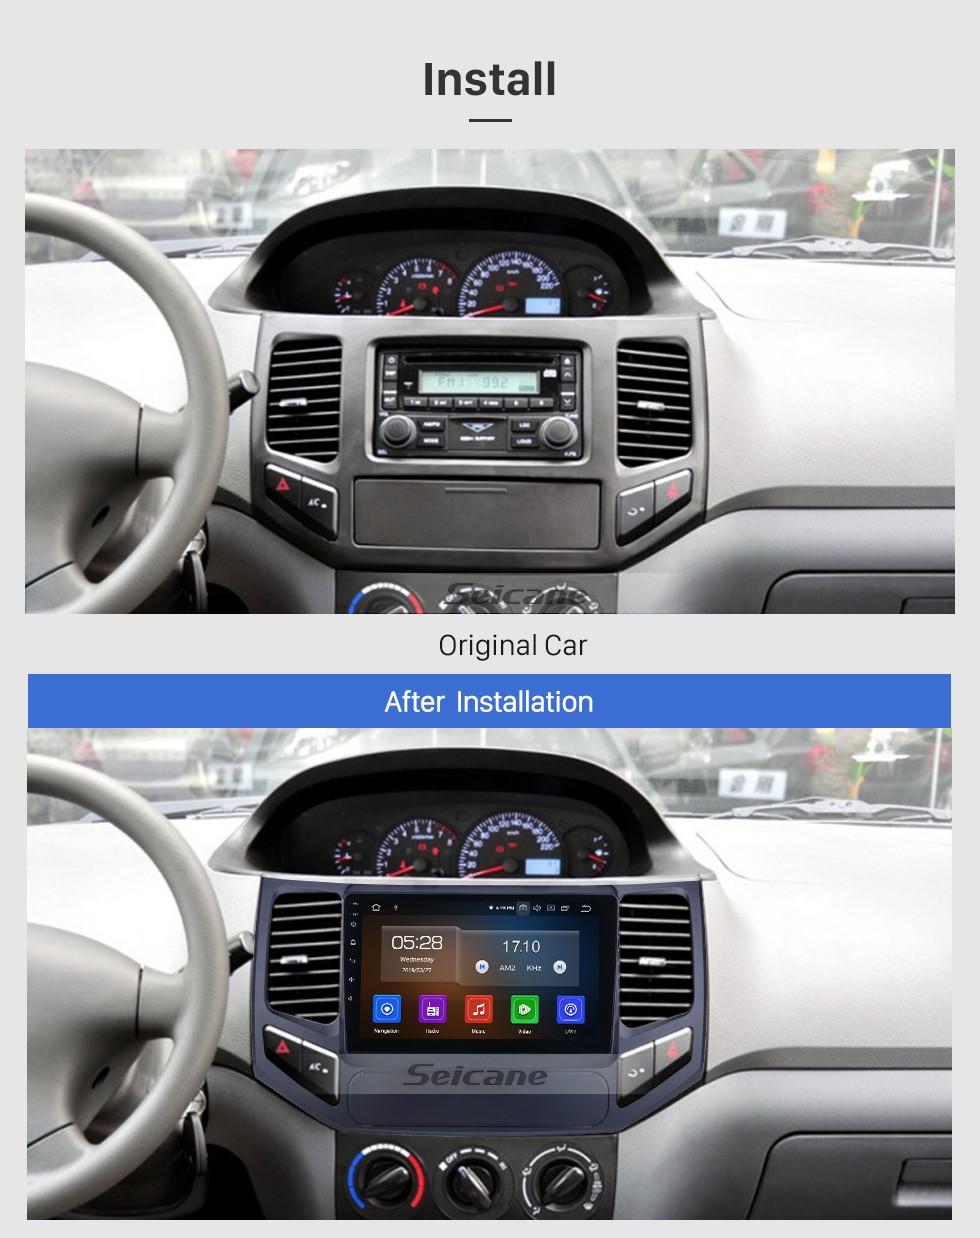 Seicane HD Touchscreen für 2009 2010 Geely King Kong Radio Android 9.0 9 Zoll GPS Navigationssystem Bluetooth WIFI Carplay Unterstützung DVR DAB +